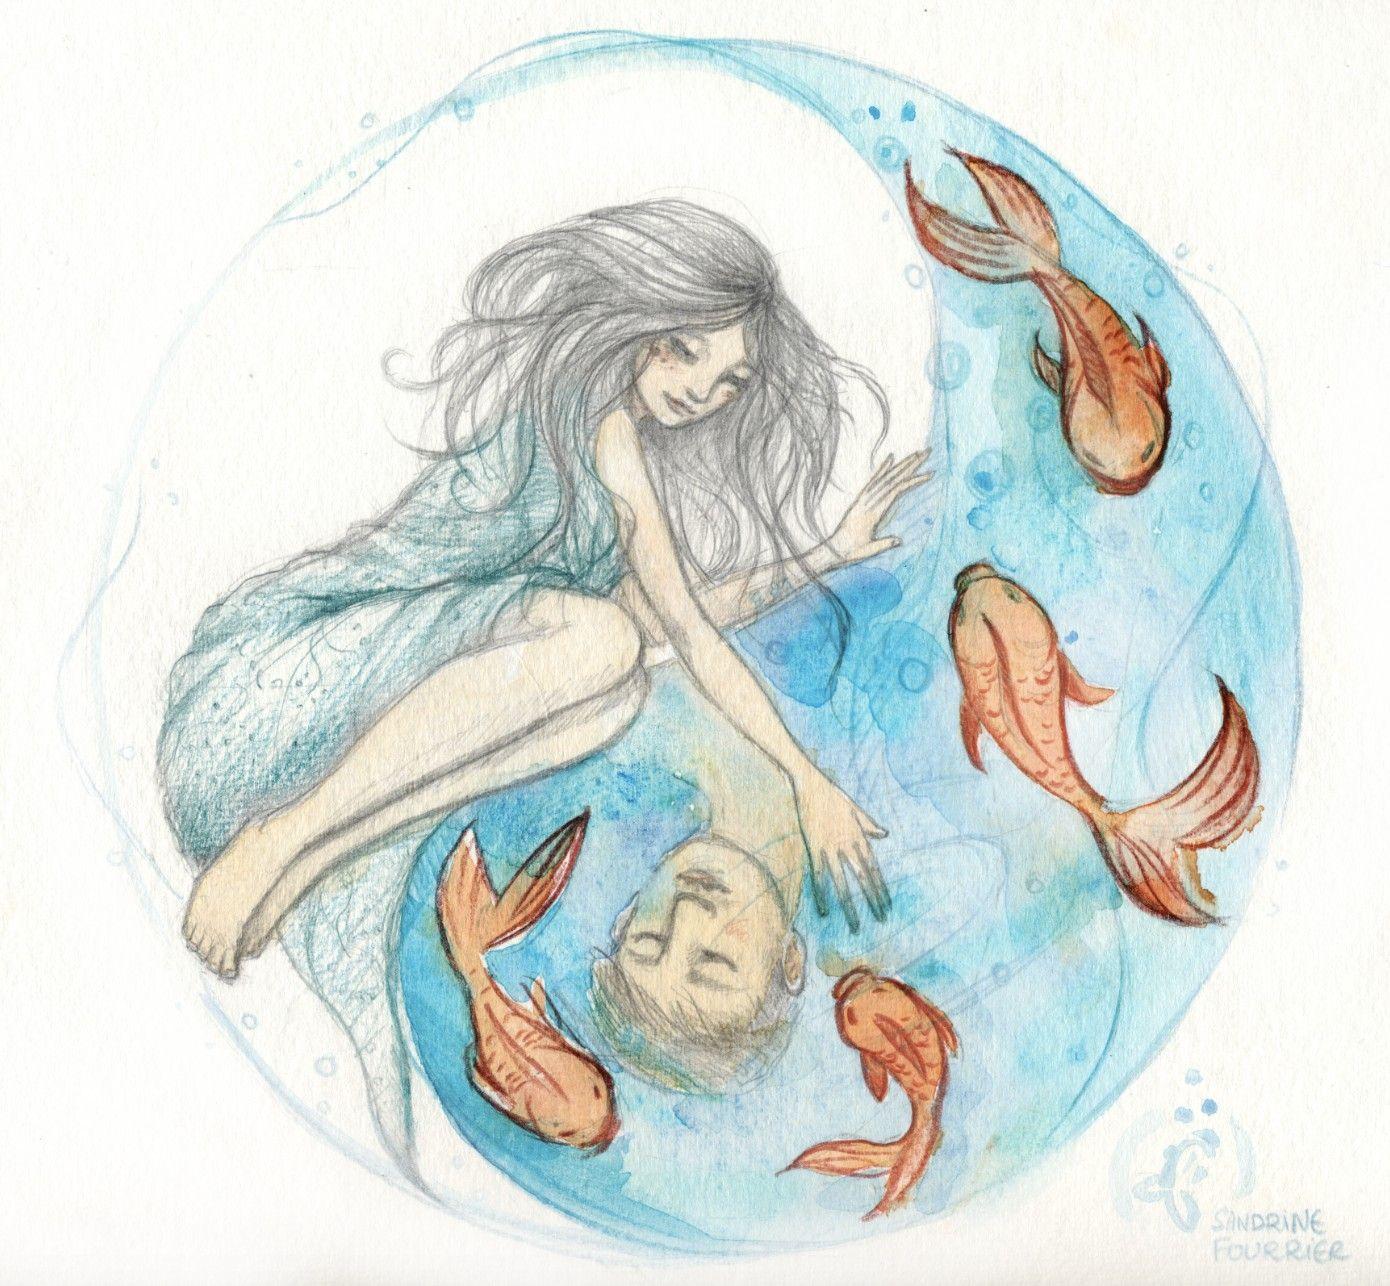 yinyang love watercolor pencil wwwsandrinefourrier